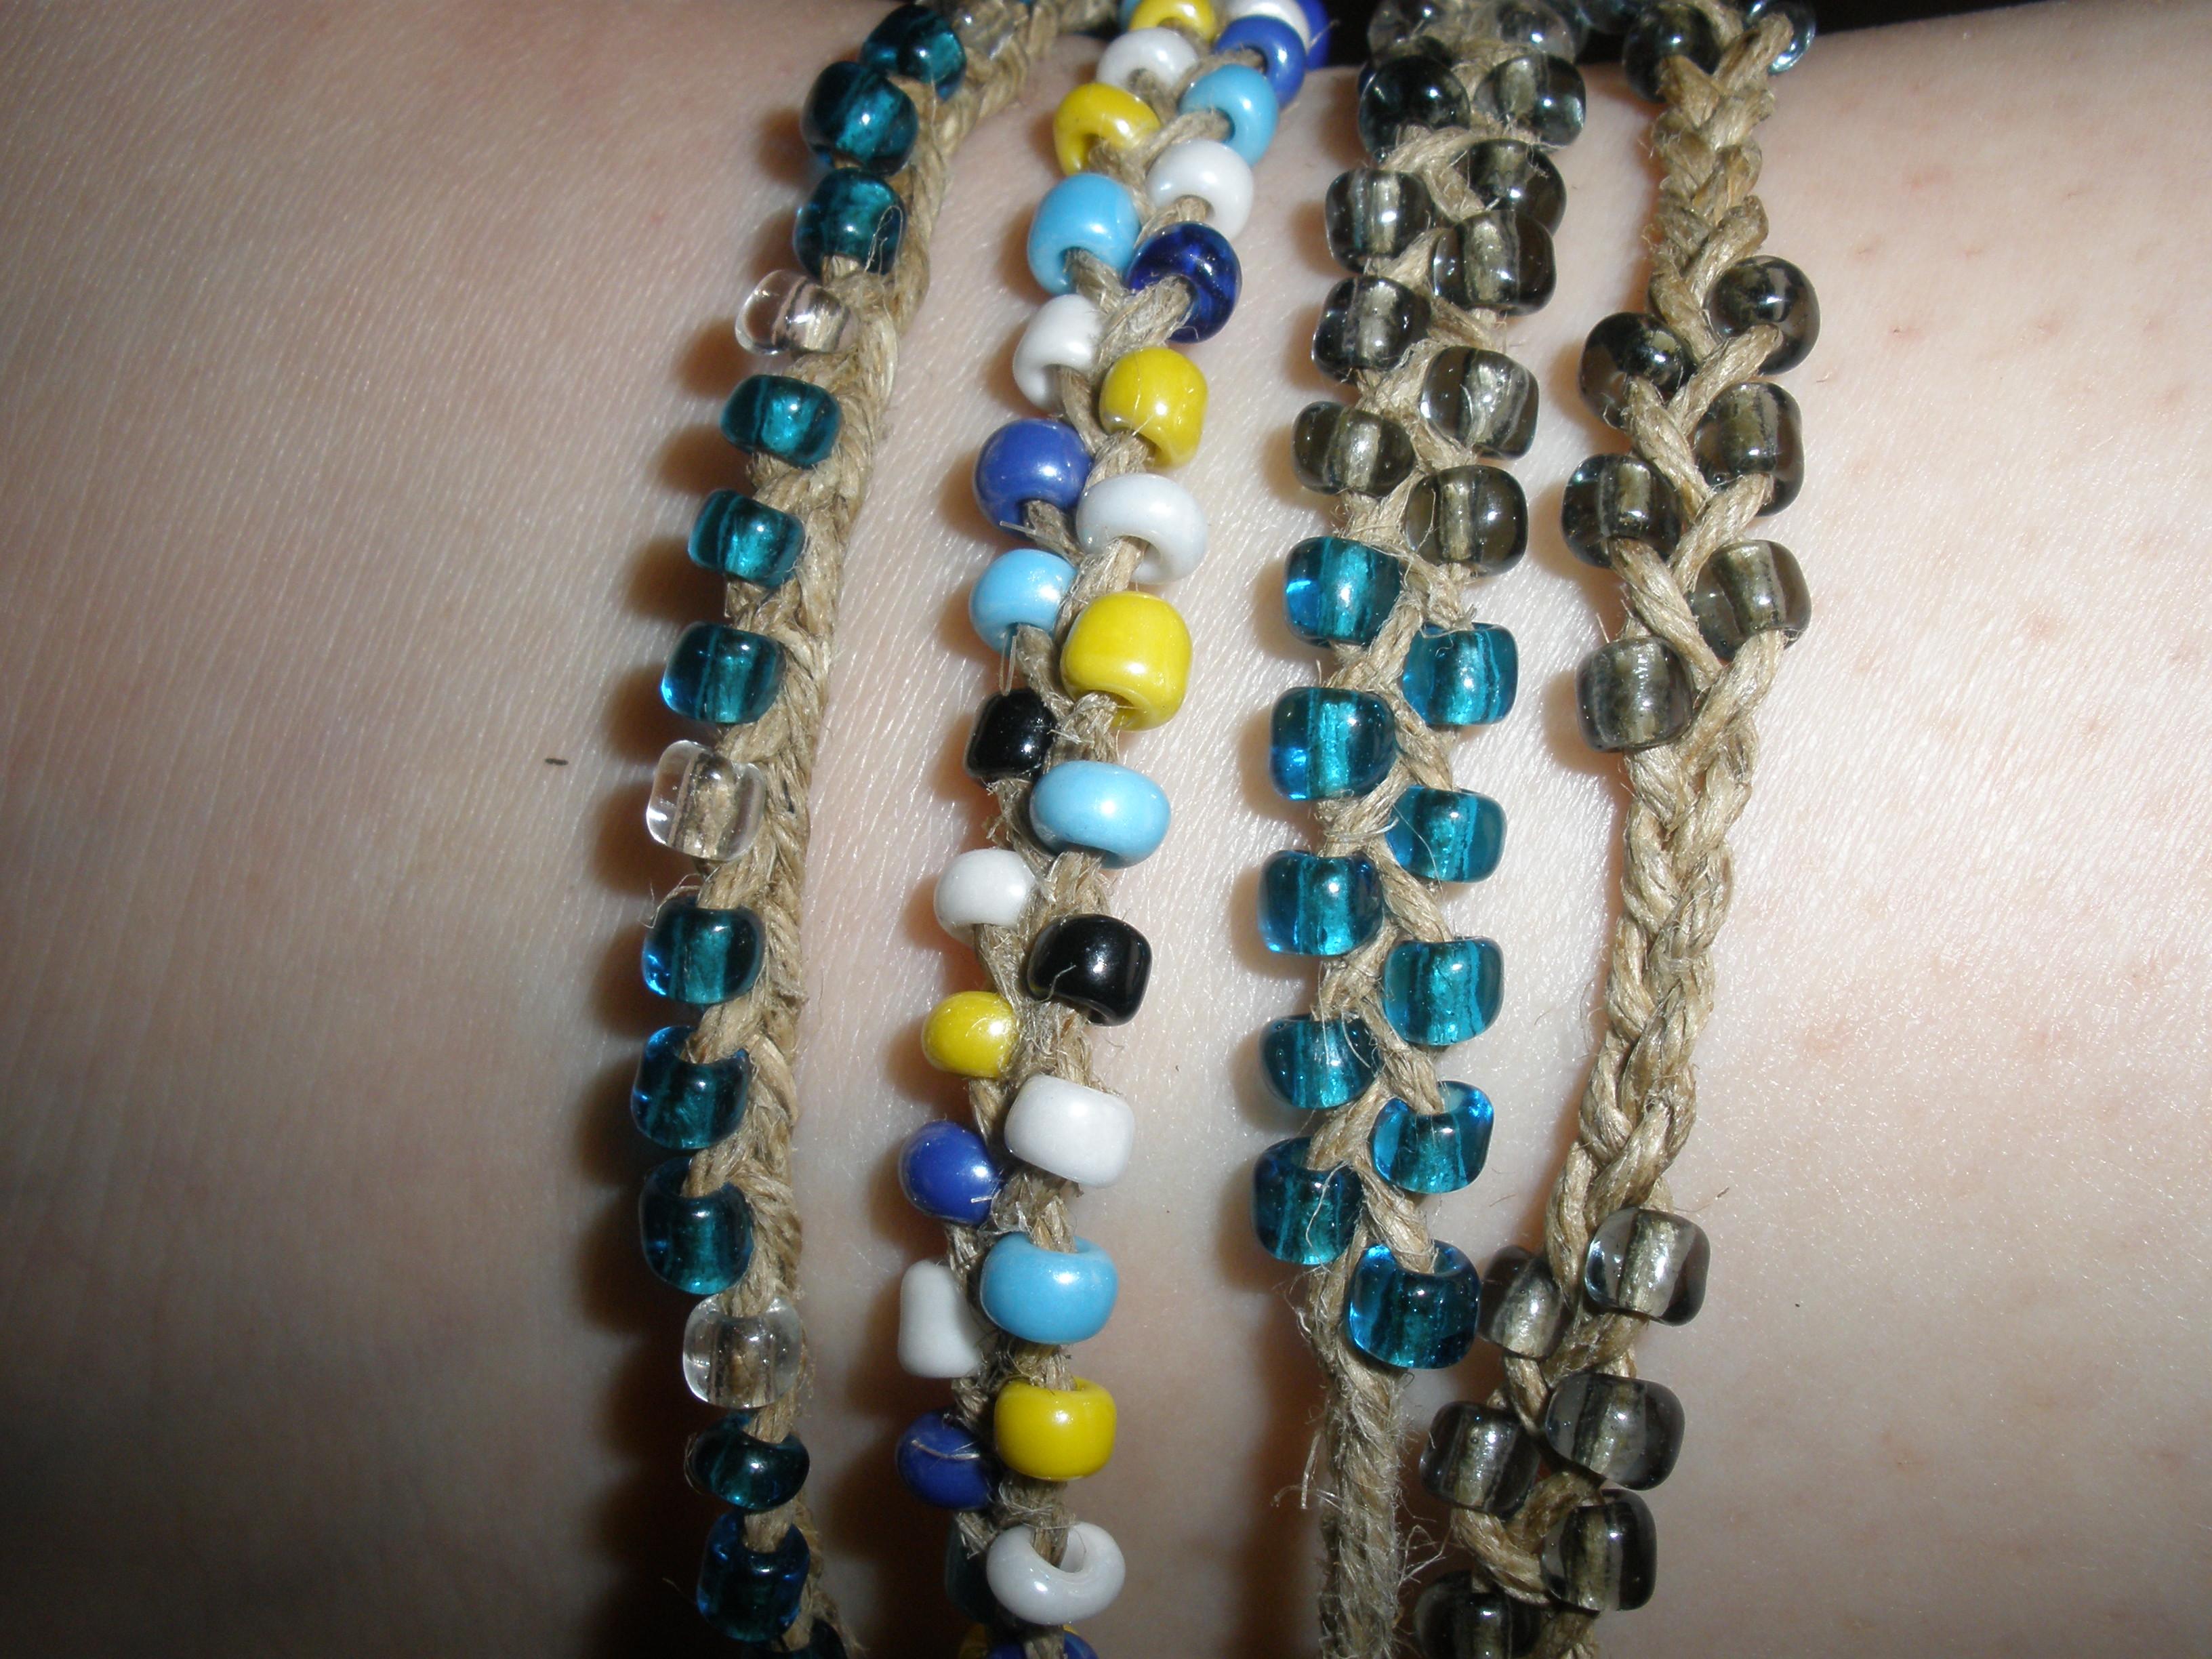 How To Make a Braided Bracelet Using Hemp Cord